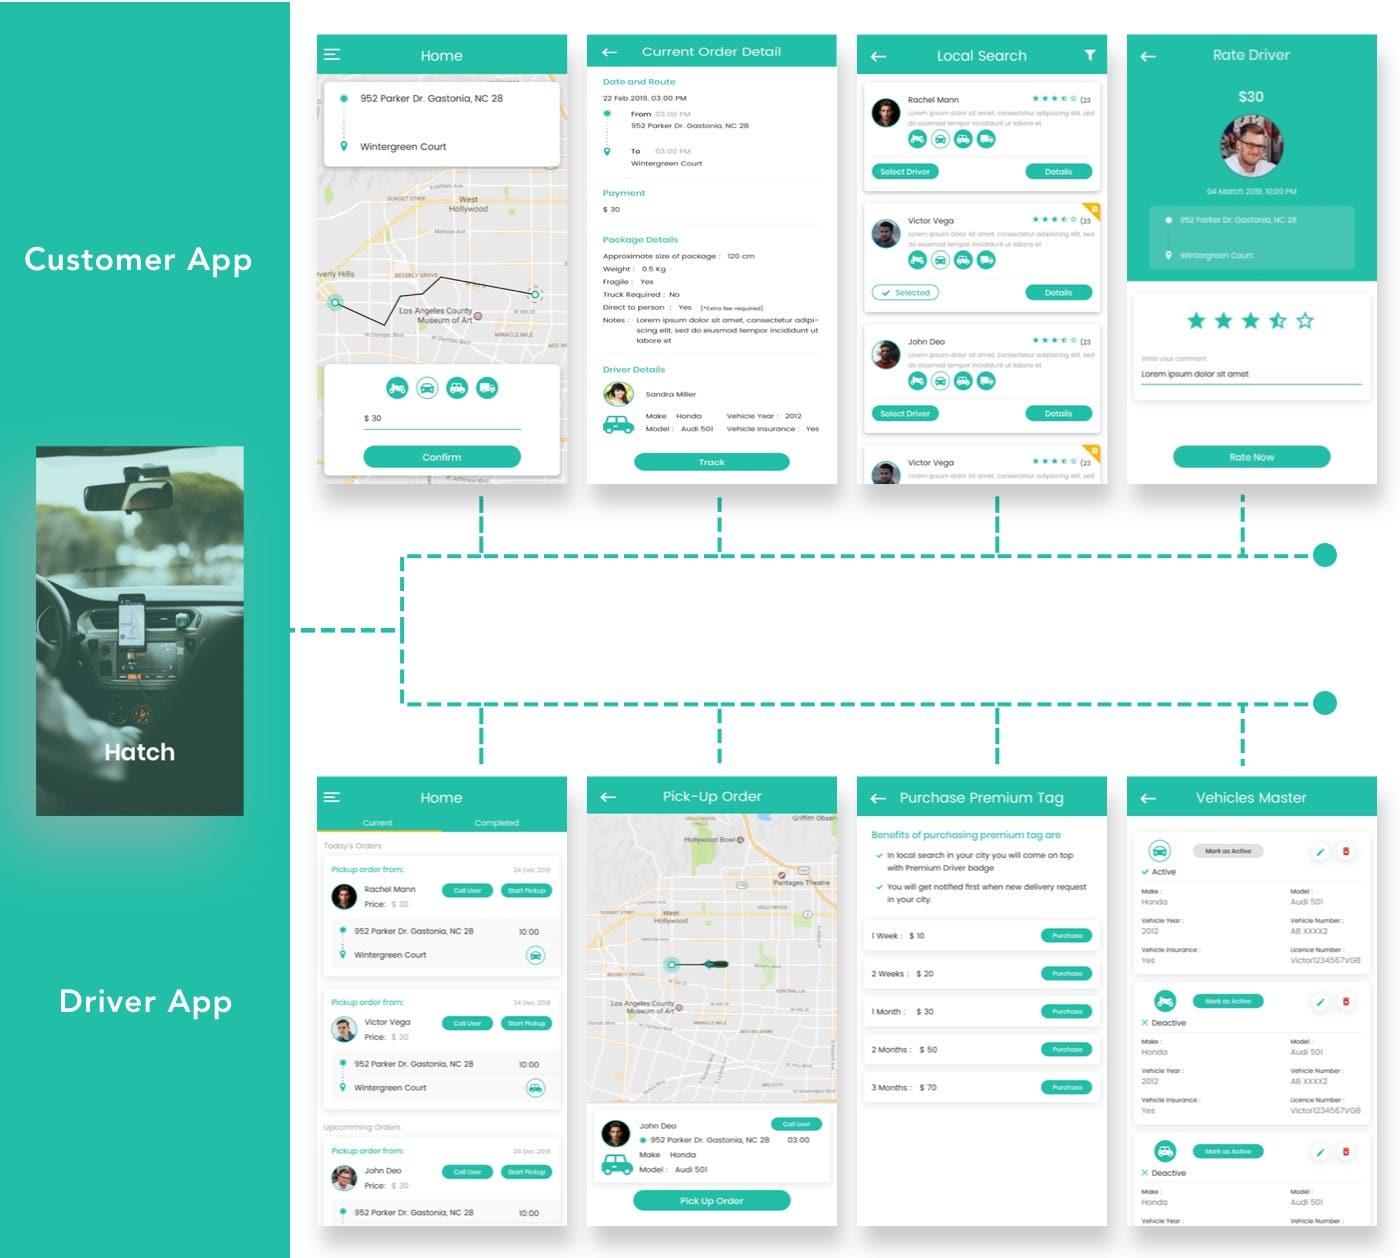 hatch-app-website.jpg